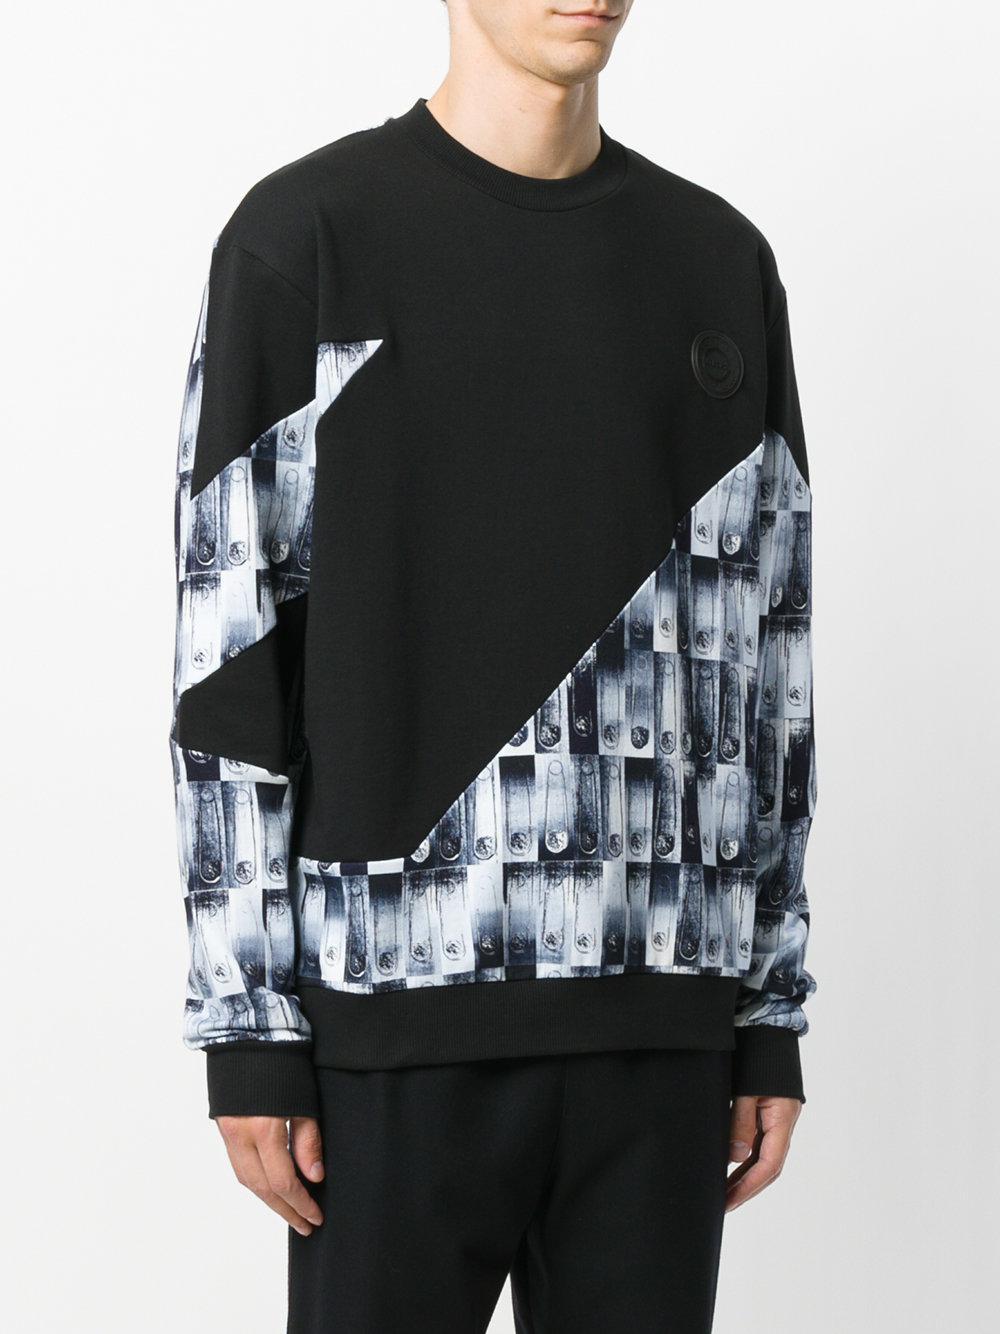 Versus Cotton Safety Pin Panels Sweatshirt, Black Jumper for Men